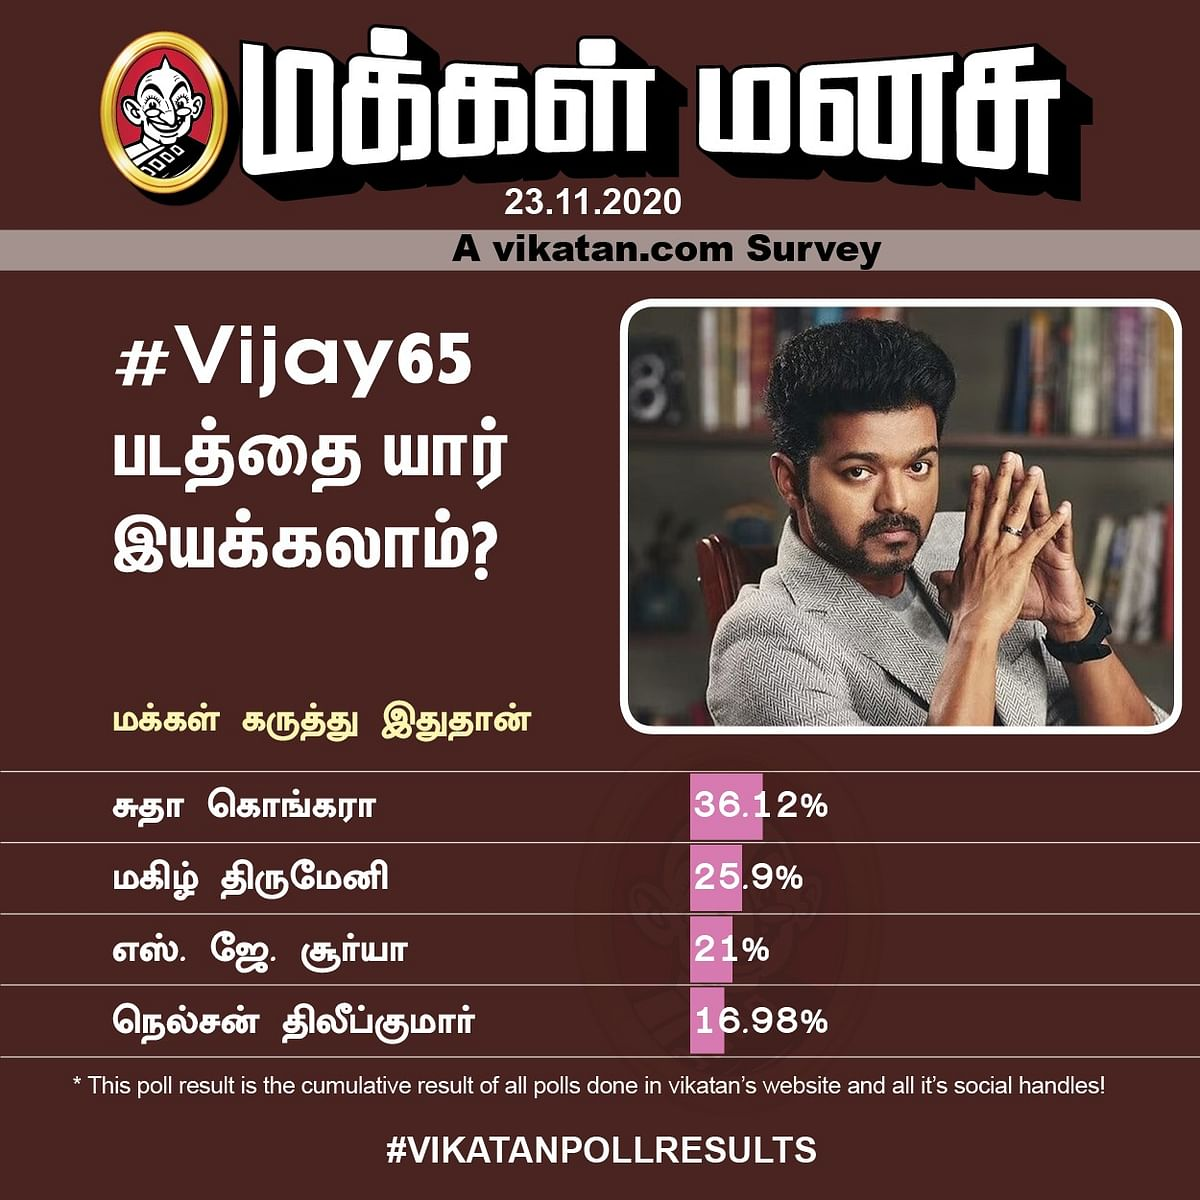 Vijay 65